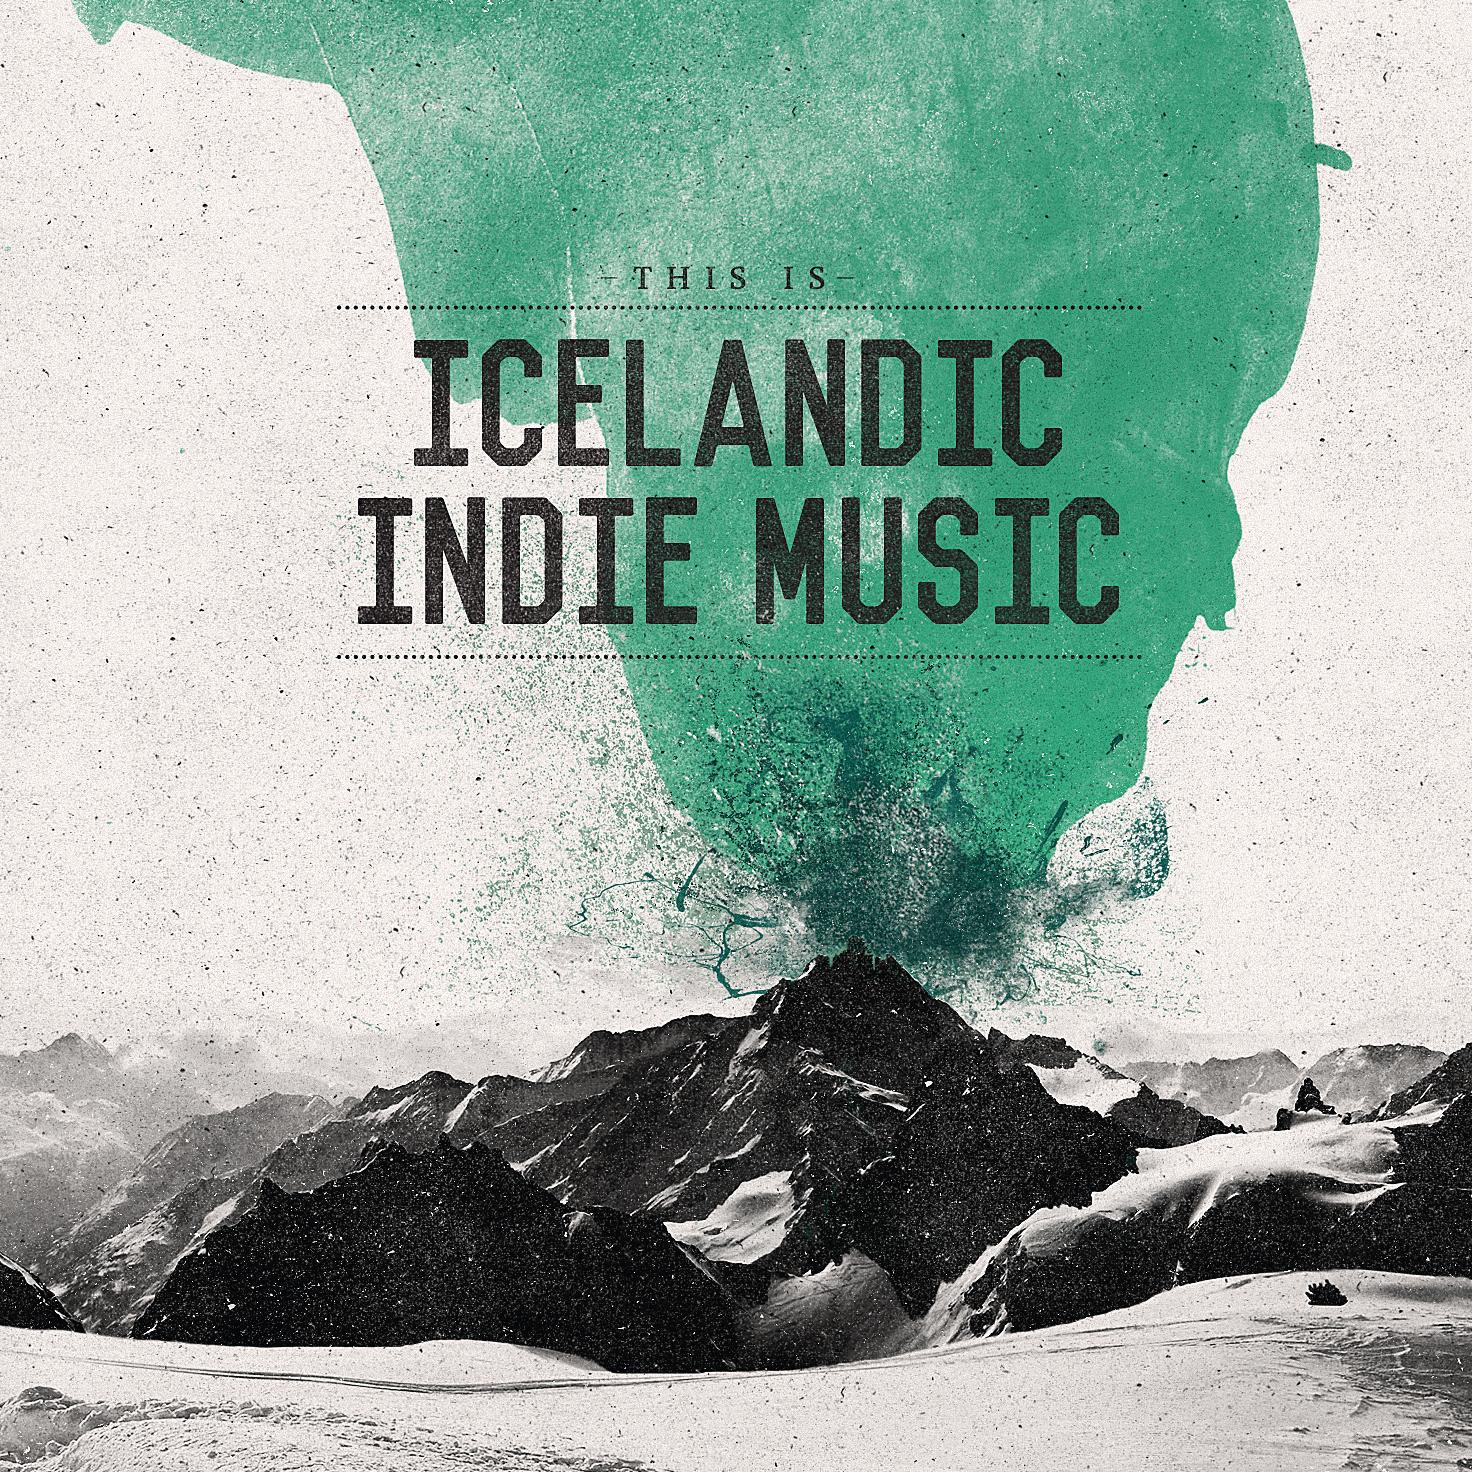 This Is Icelandic Indie Music